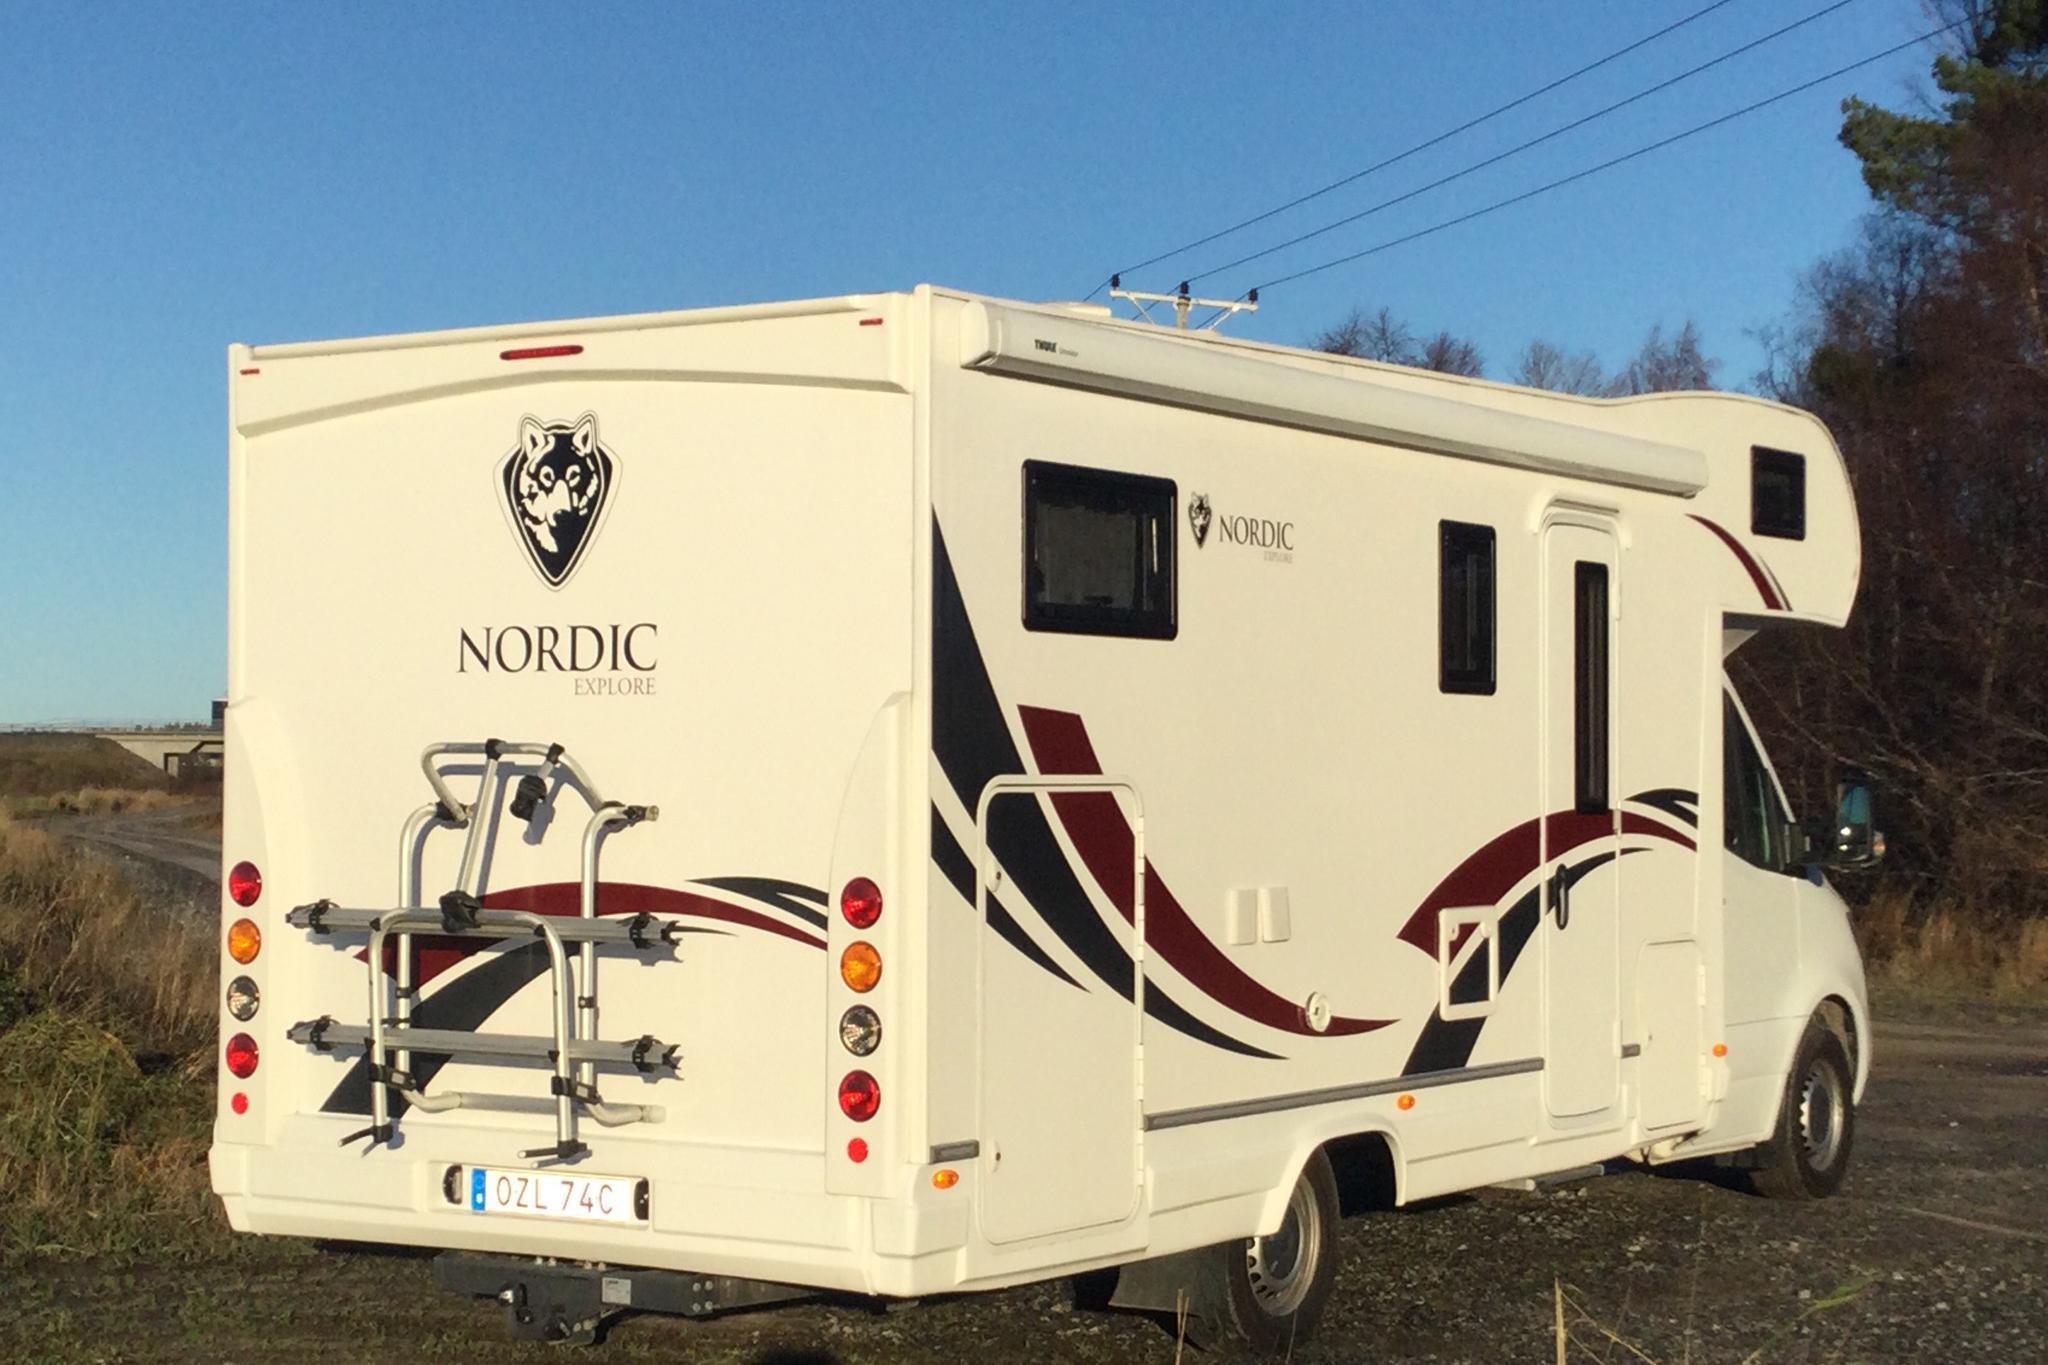 Mercedes-Benz NORDIC EXPLORE A Husbil - 6 890 km - Automatic - white - 2020